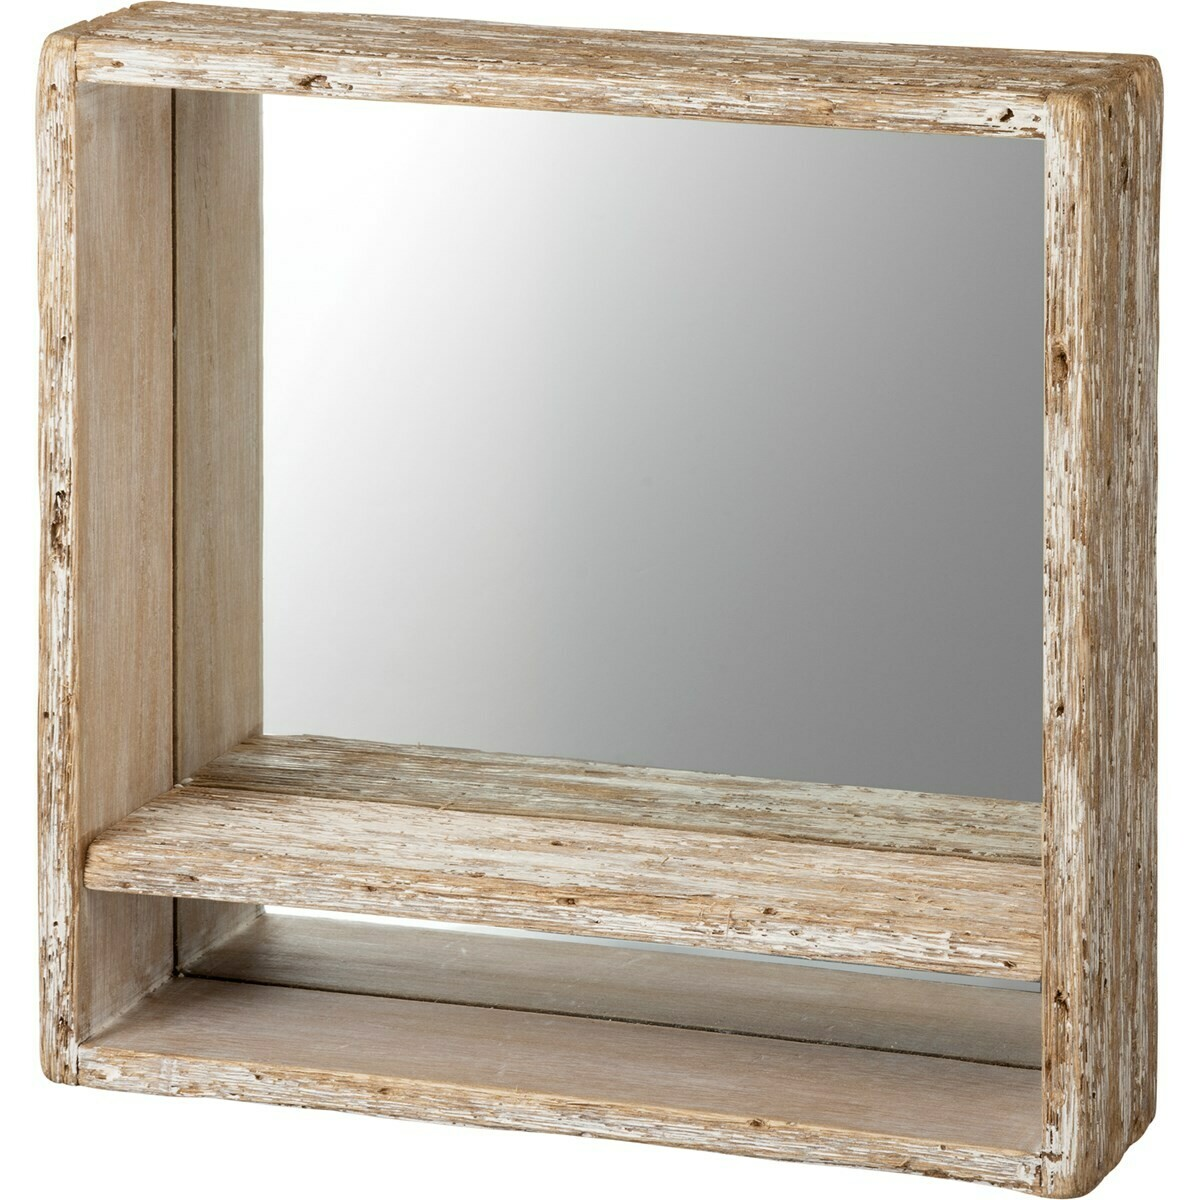 Rustic Mirror Shelf